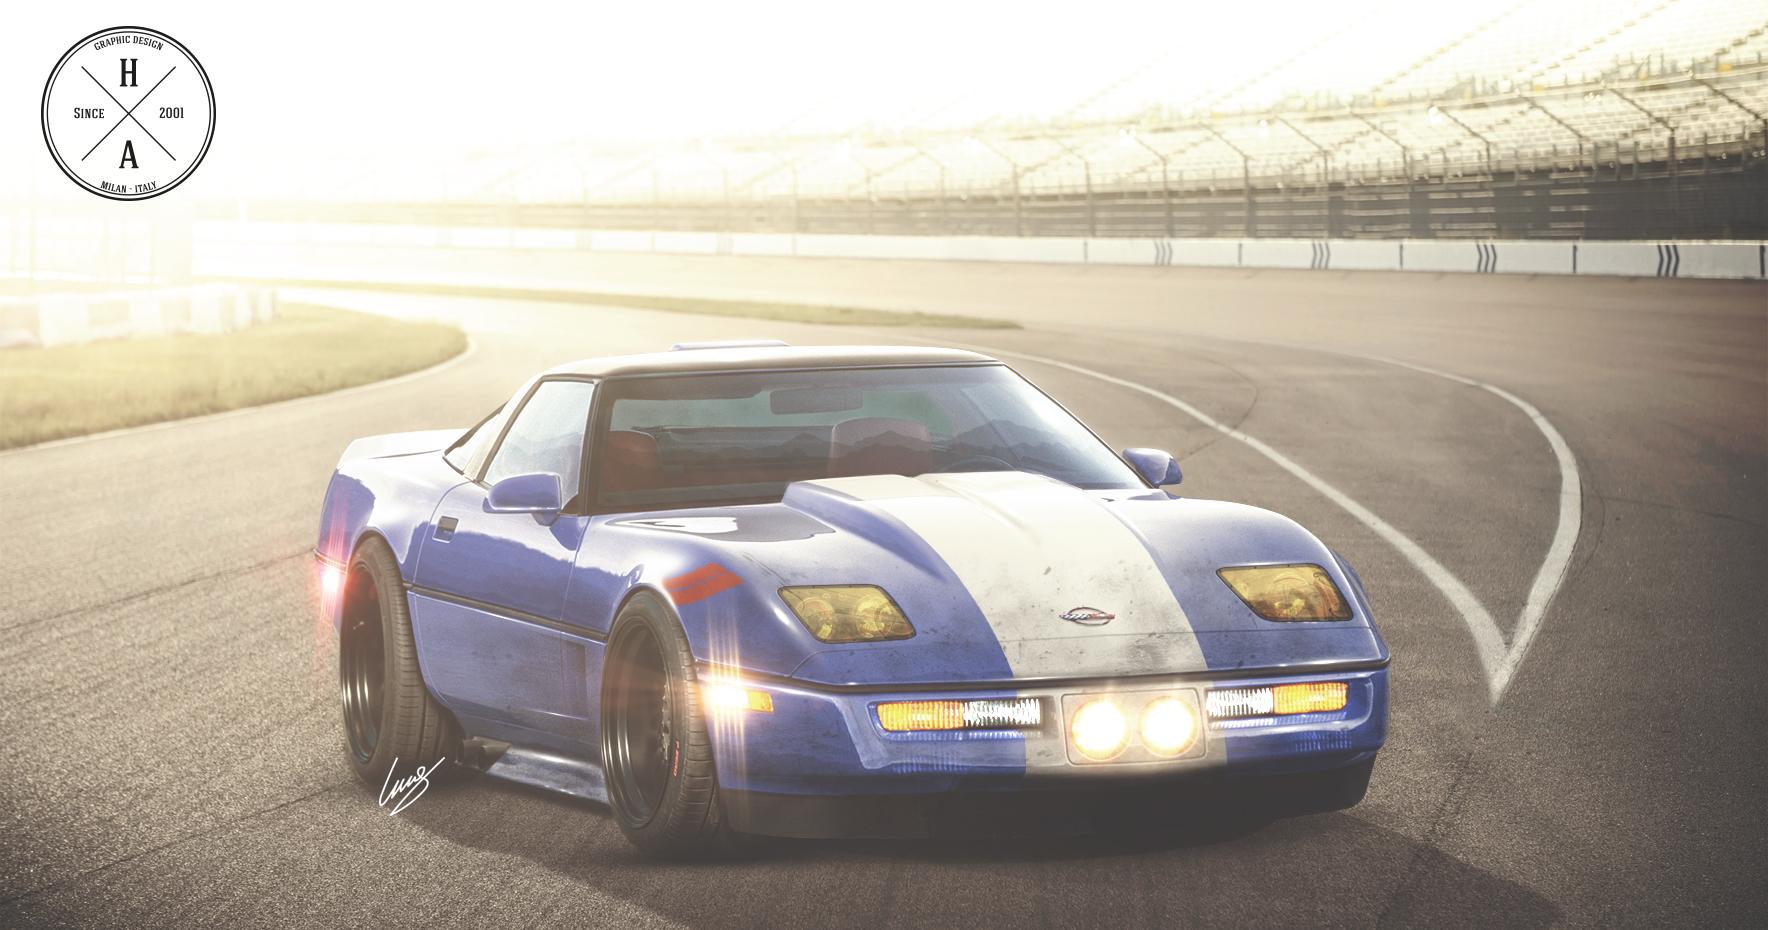 Corvette C4 Race by ilPoli on DeviantArt